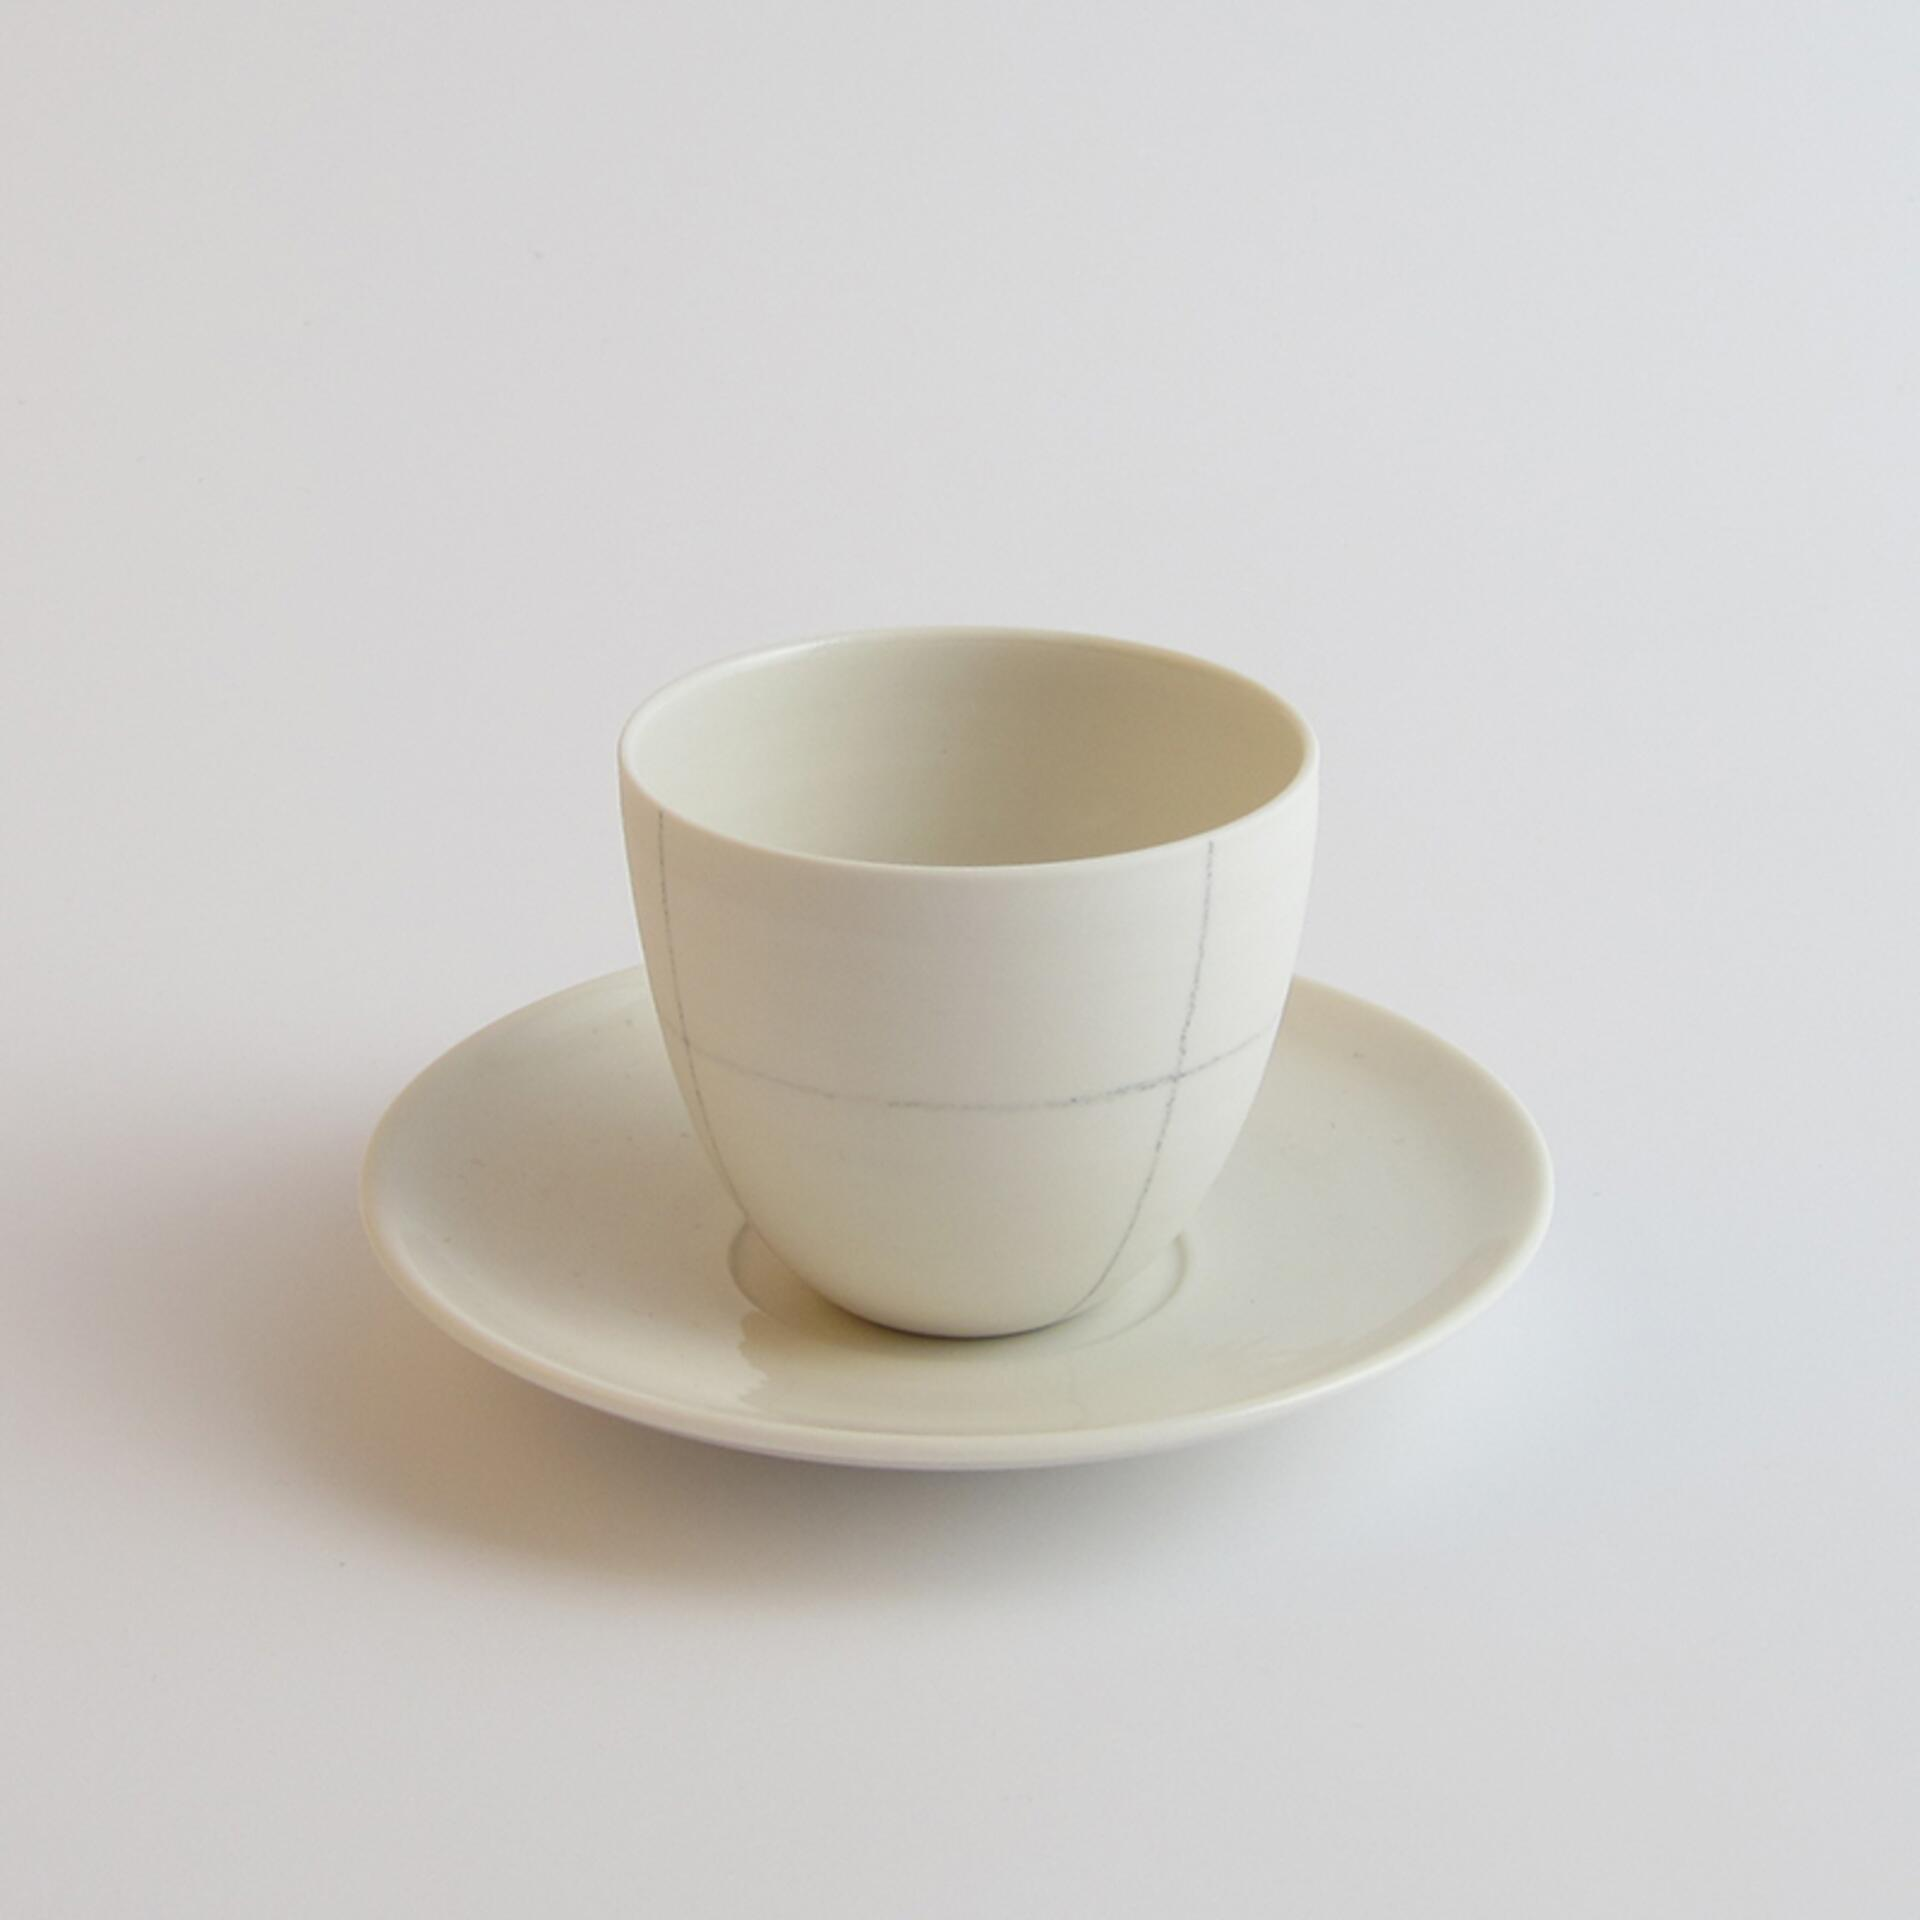 Schoemig Porzellan Espressotasse Graph Rechteck 1